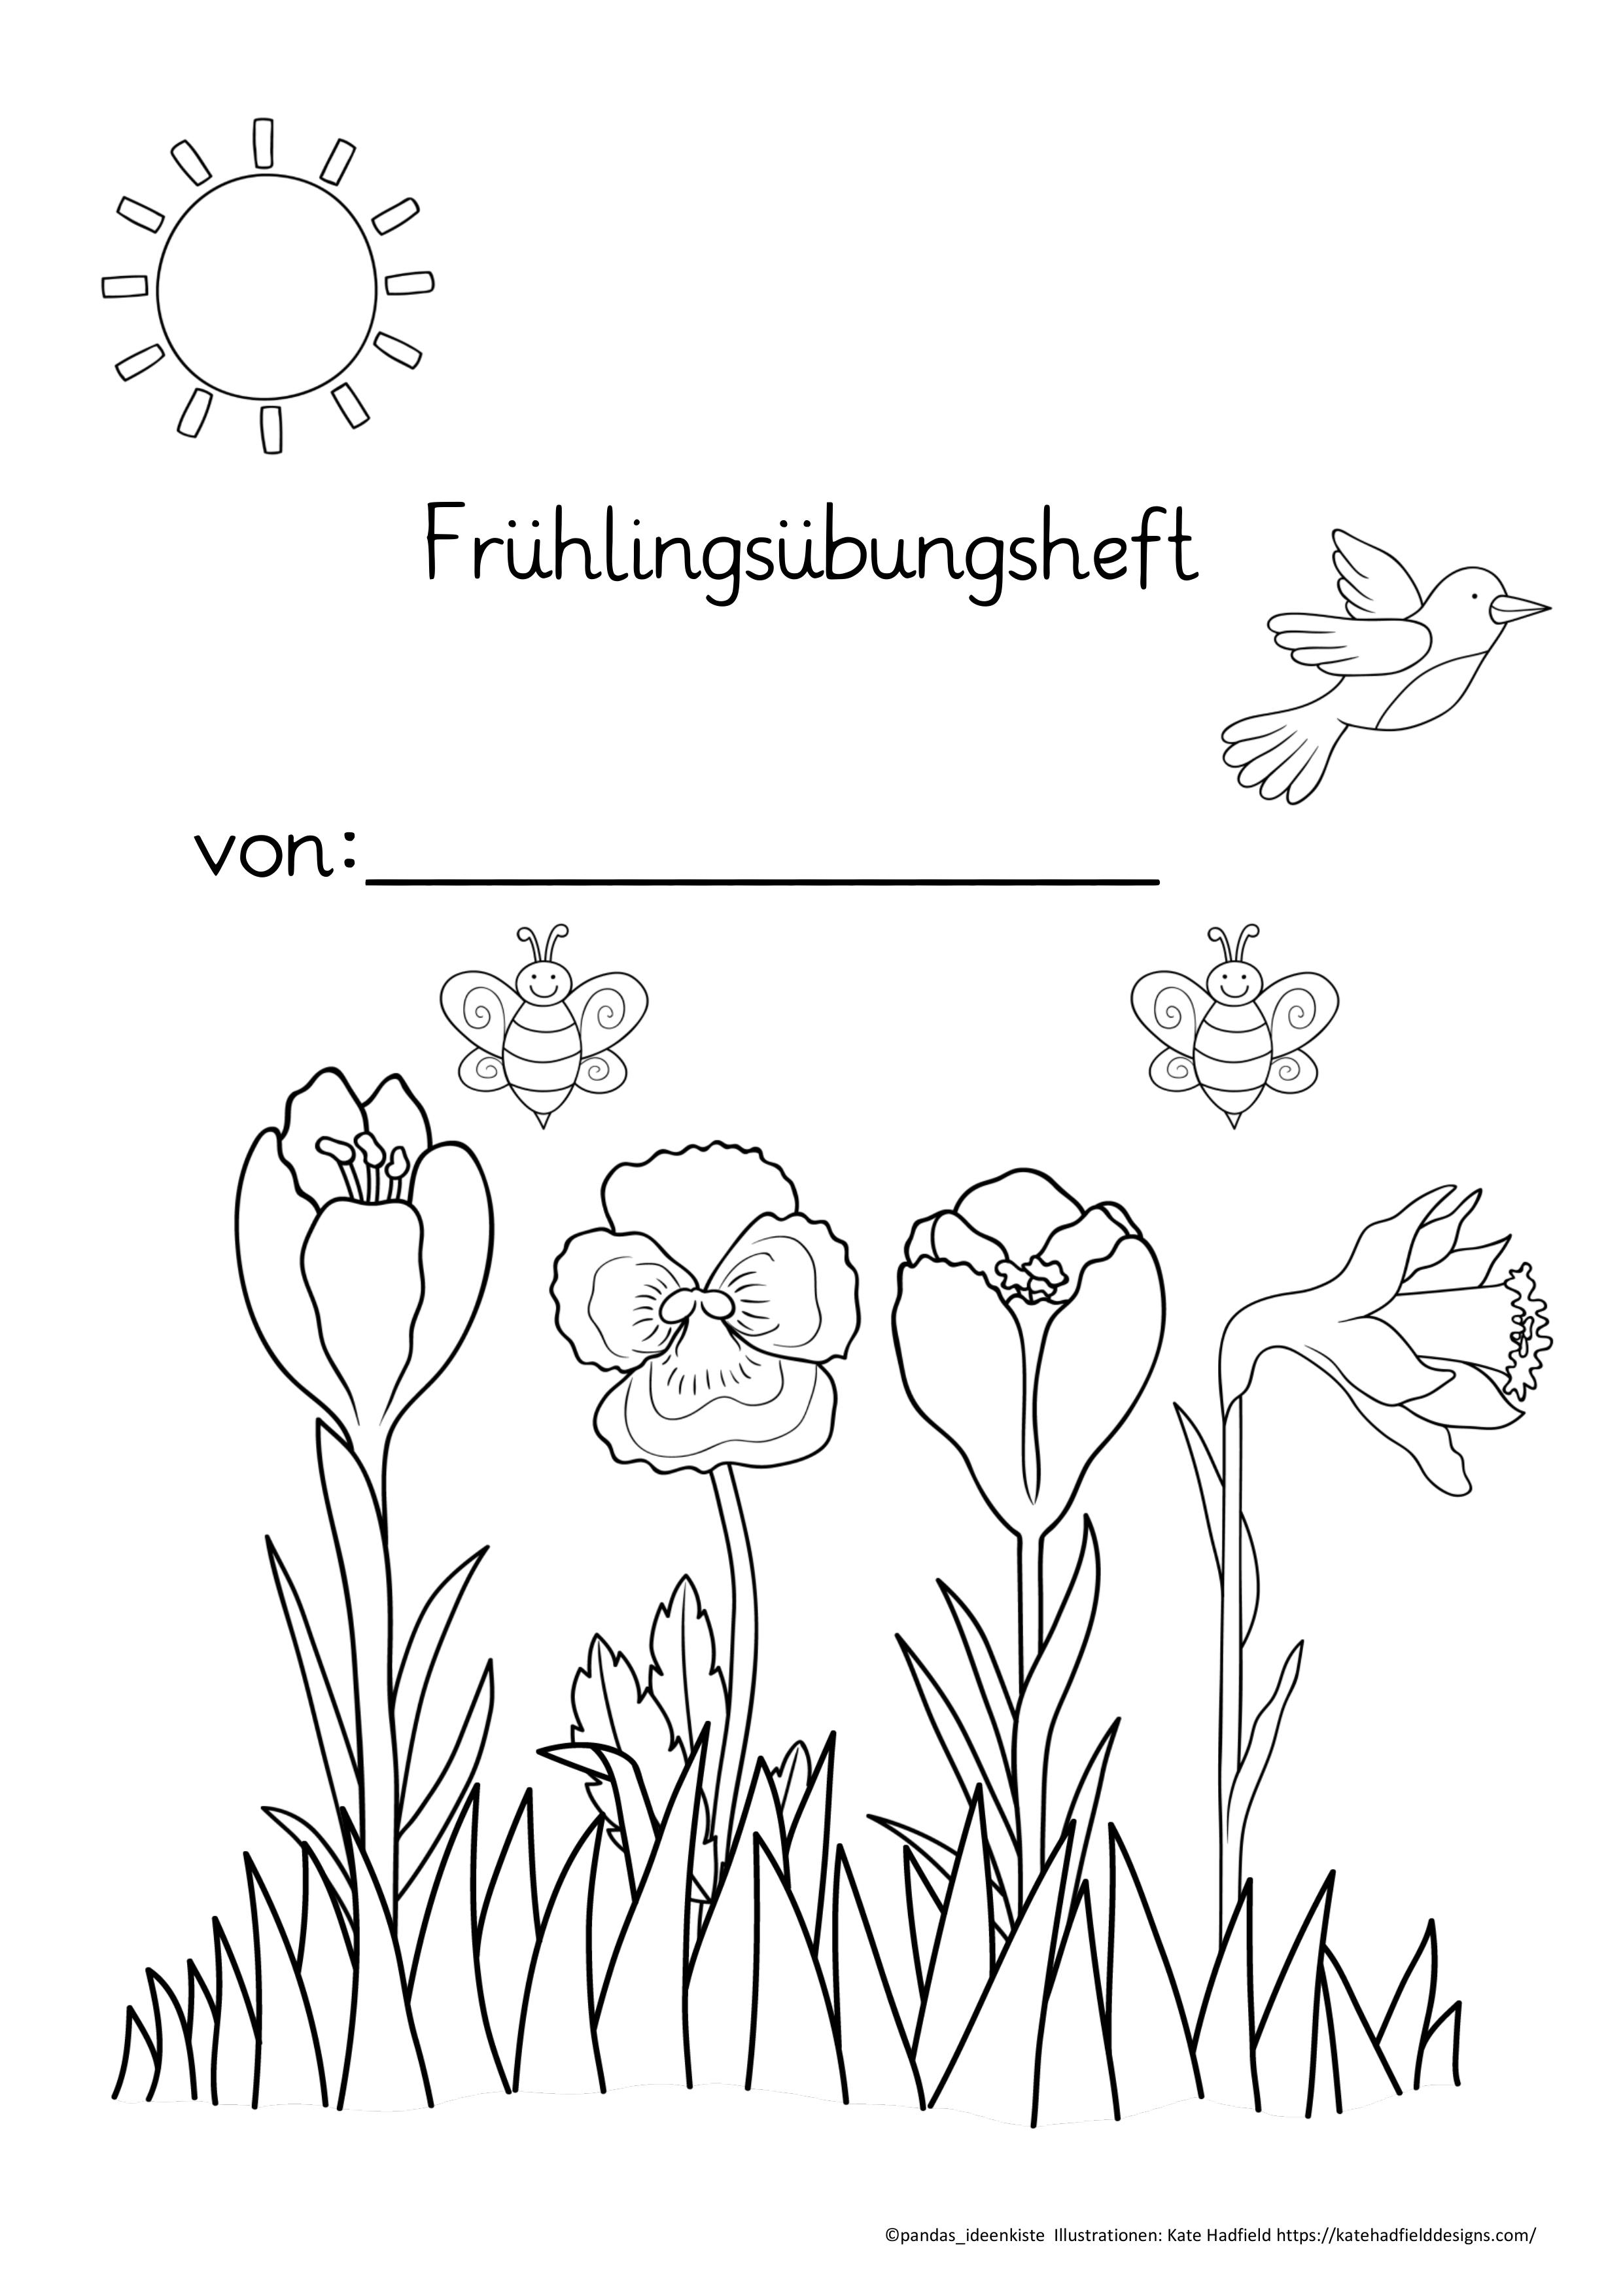 Fruhlingsubungsheft Klasse 1 Deutsch Und Mathe